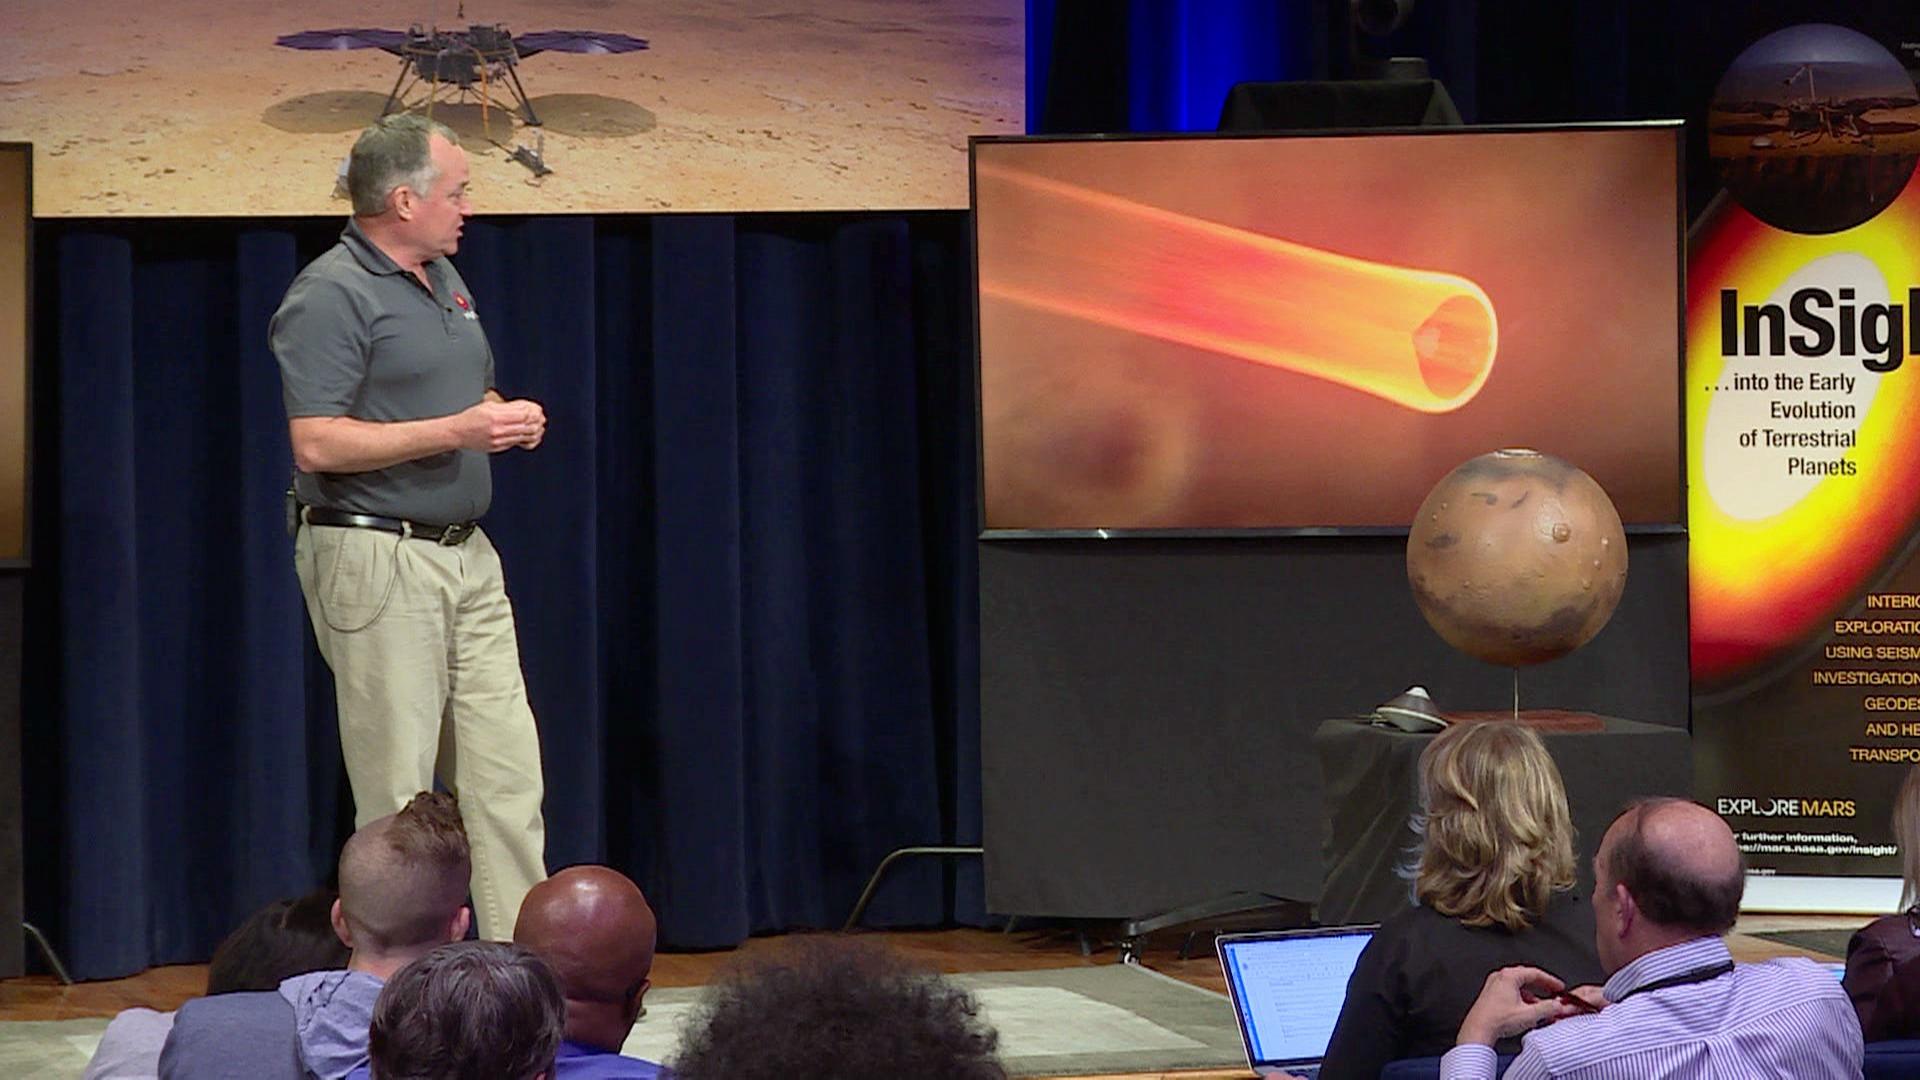 La sonda InSight de la NASA intenta riesgoso descenso en Marte.